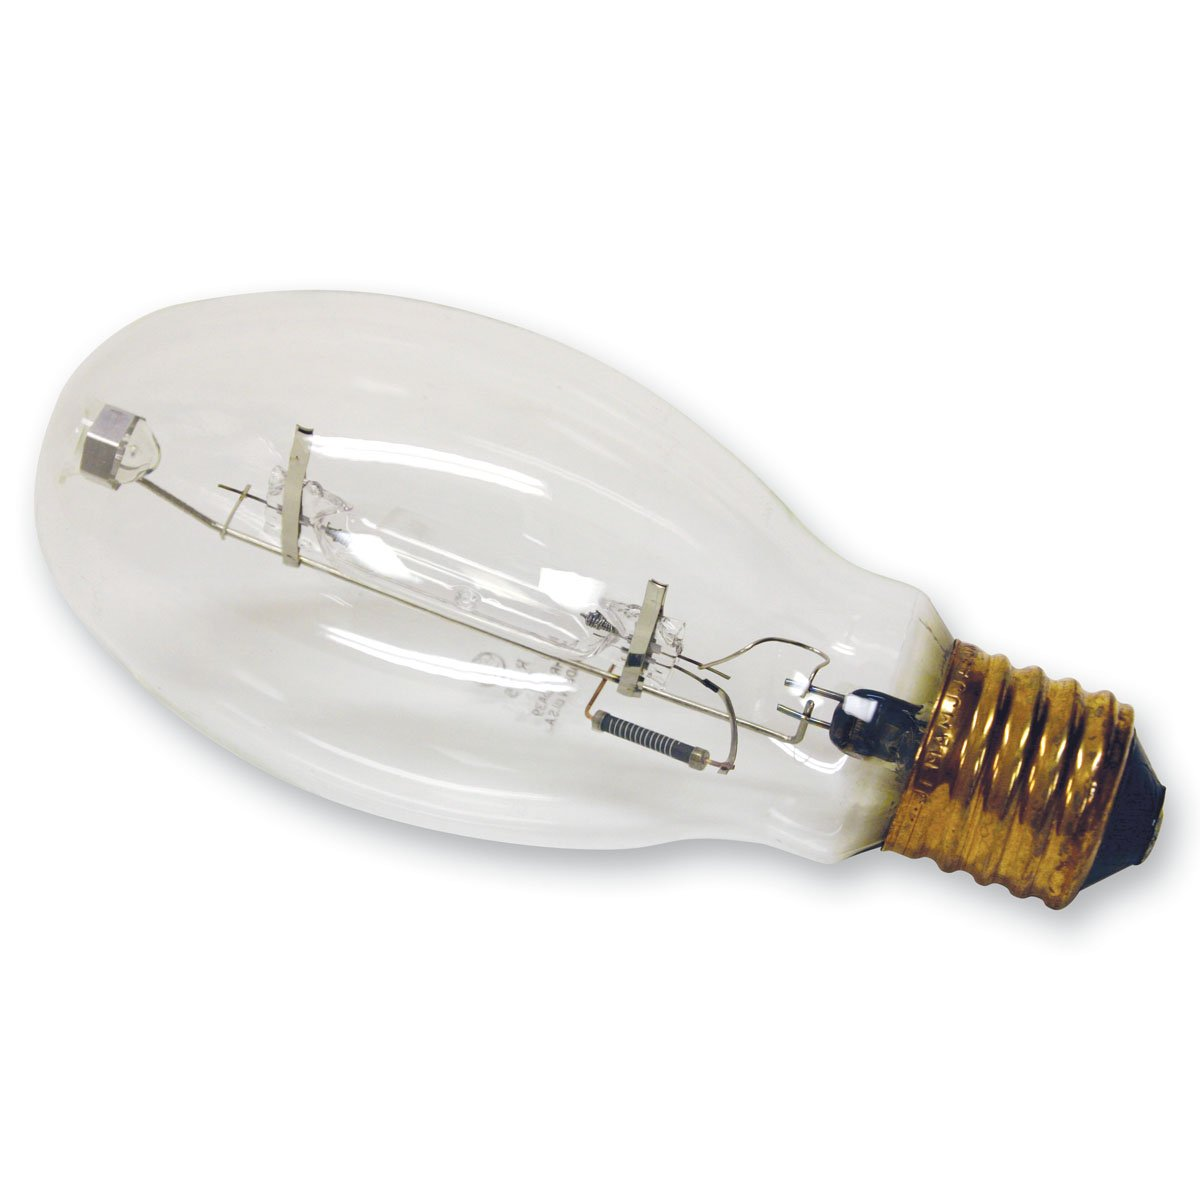 GE Lighting 18902 175-Watt HID Multi-Vapor Quartz Metal Halide Medium Base Light Bulb, 1-Pack